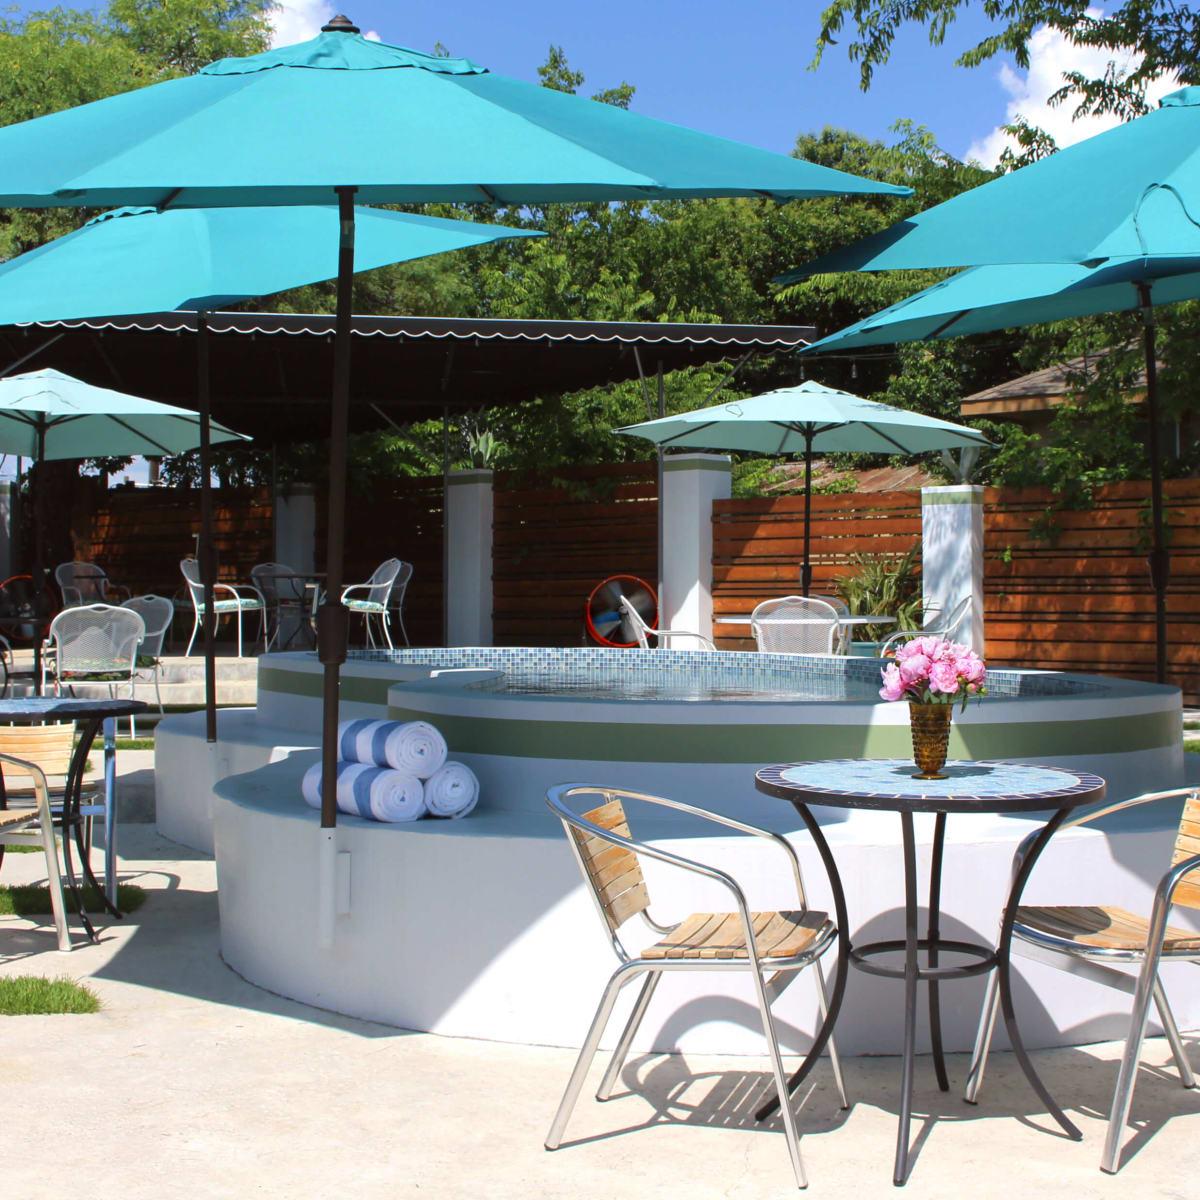 Kitty Cohen's Austin bar outdoor patio pool